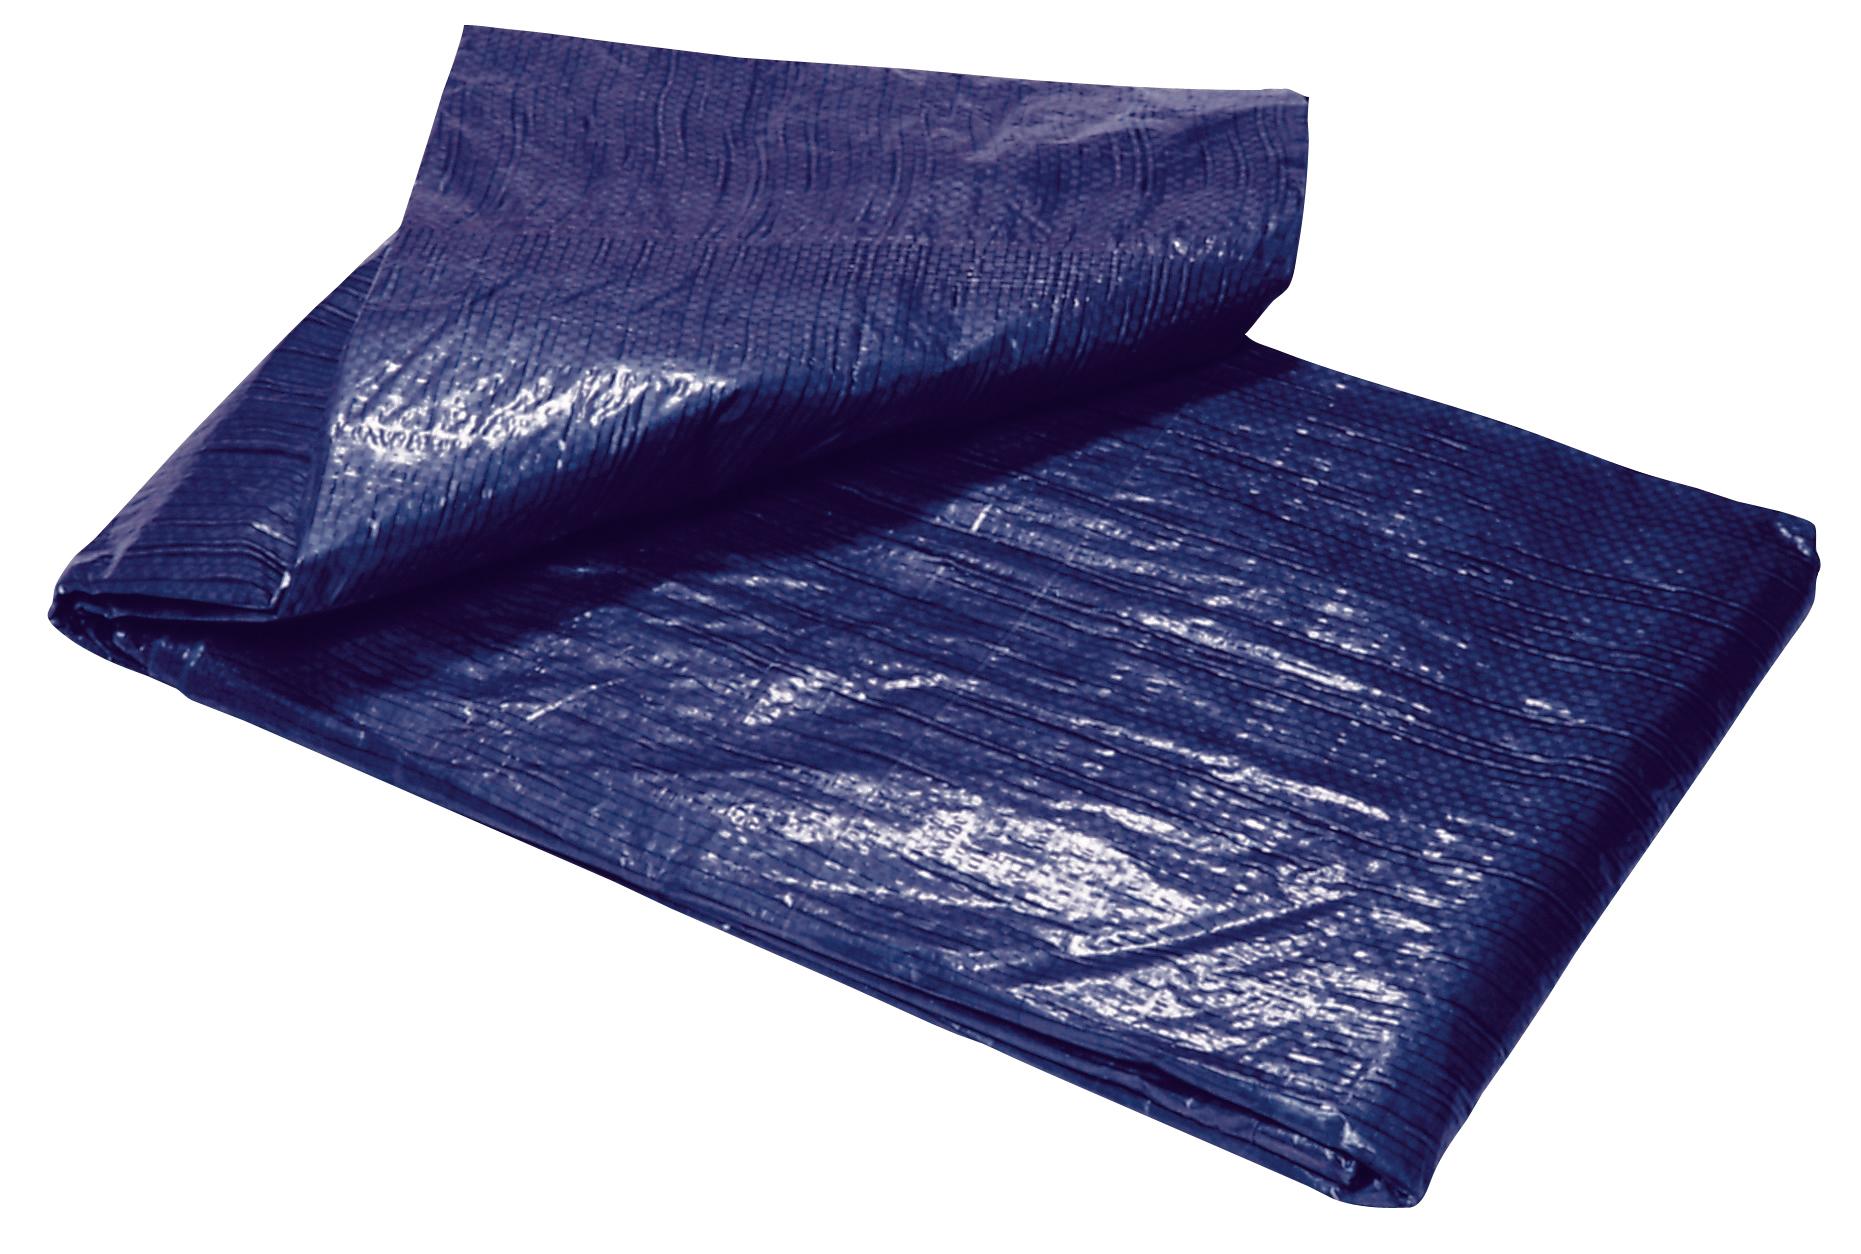 Plachta Tarpaulin Standard 04x06, prekrývacia, 80 g/m2, modrá